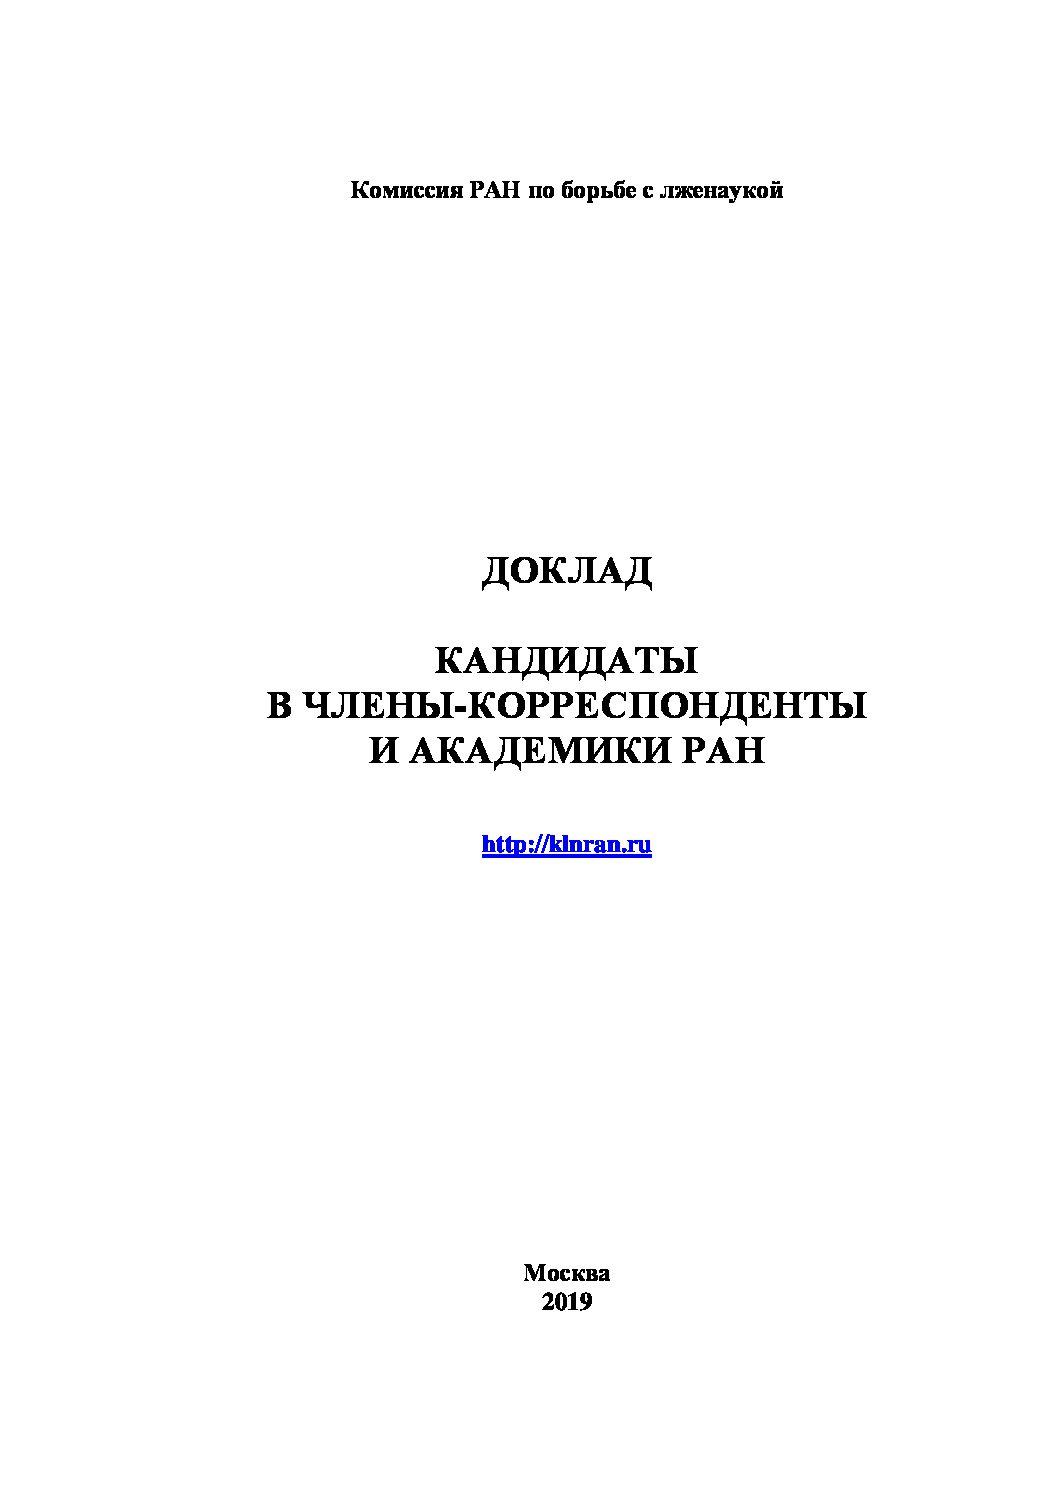 Report_1911